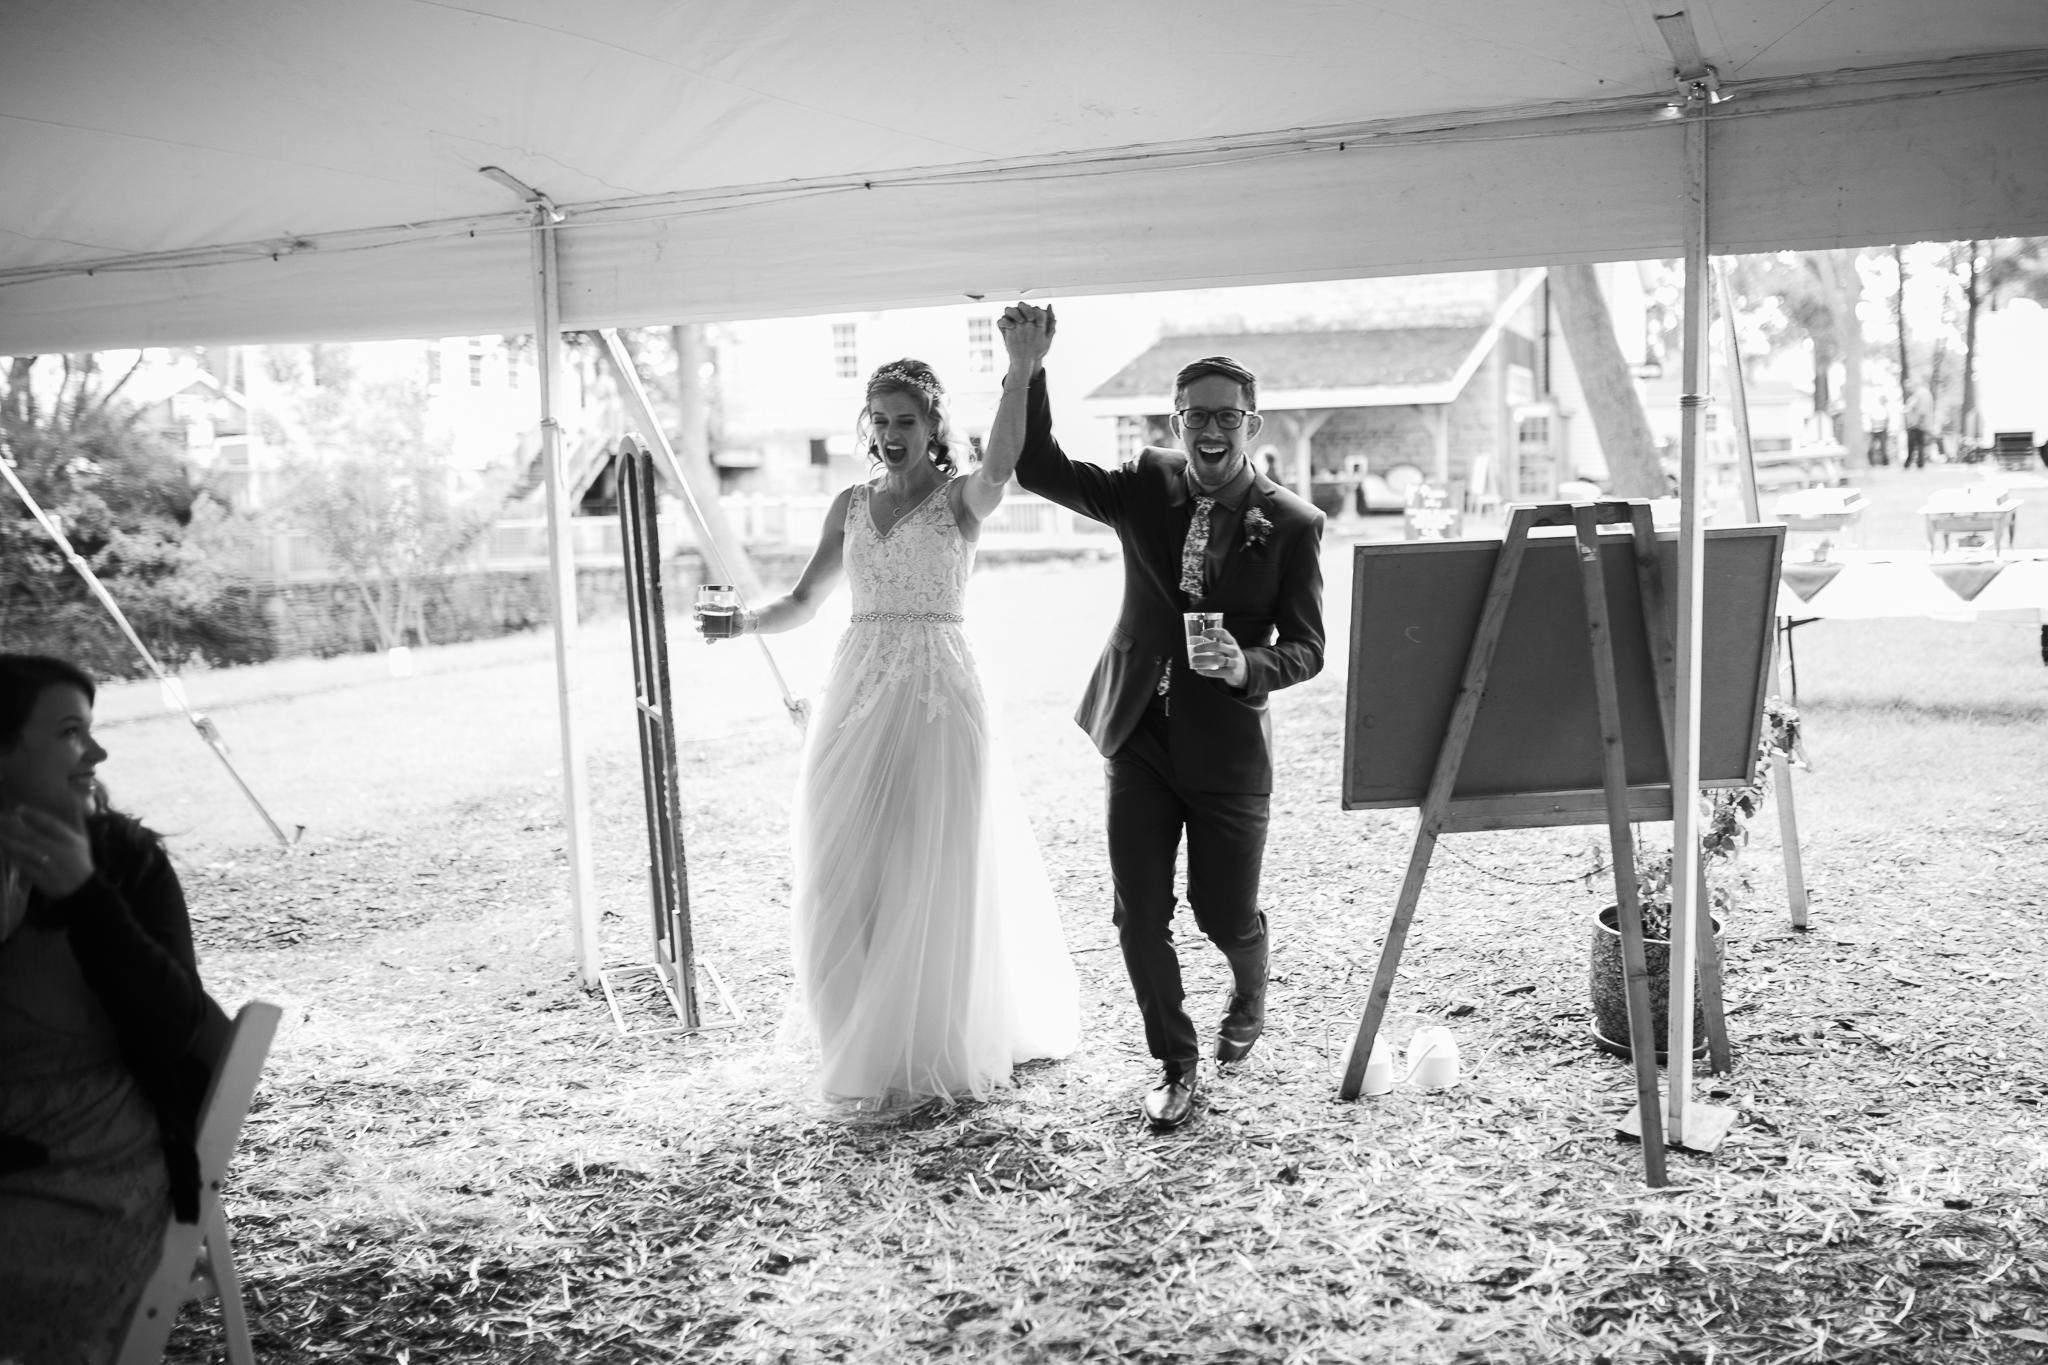 Paoli-Mill-wedding-summer-Wisconsin_164.jpg